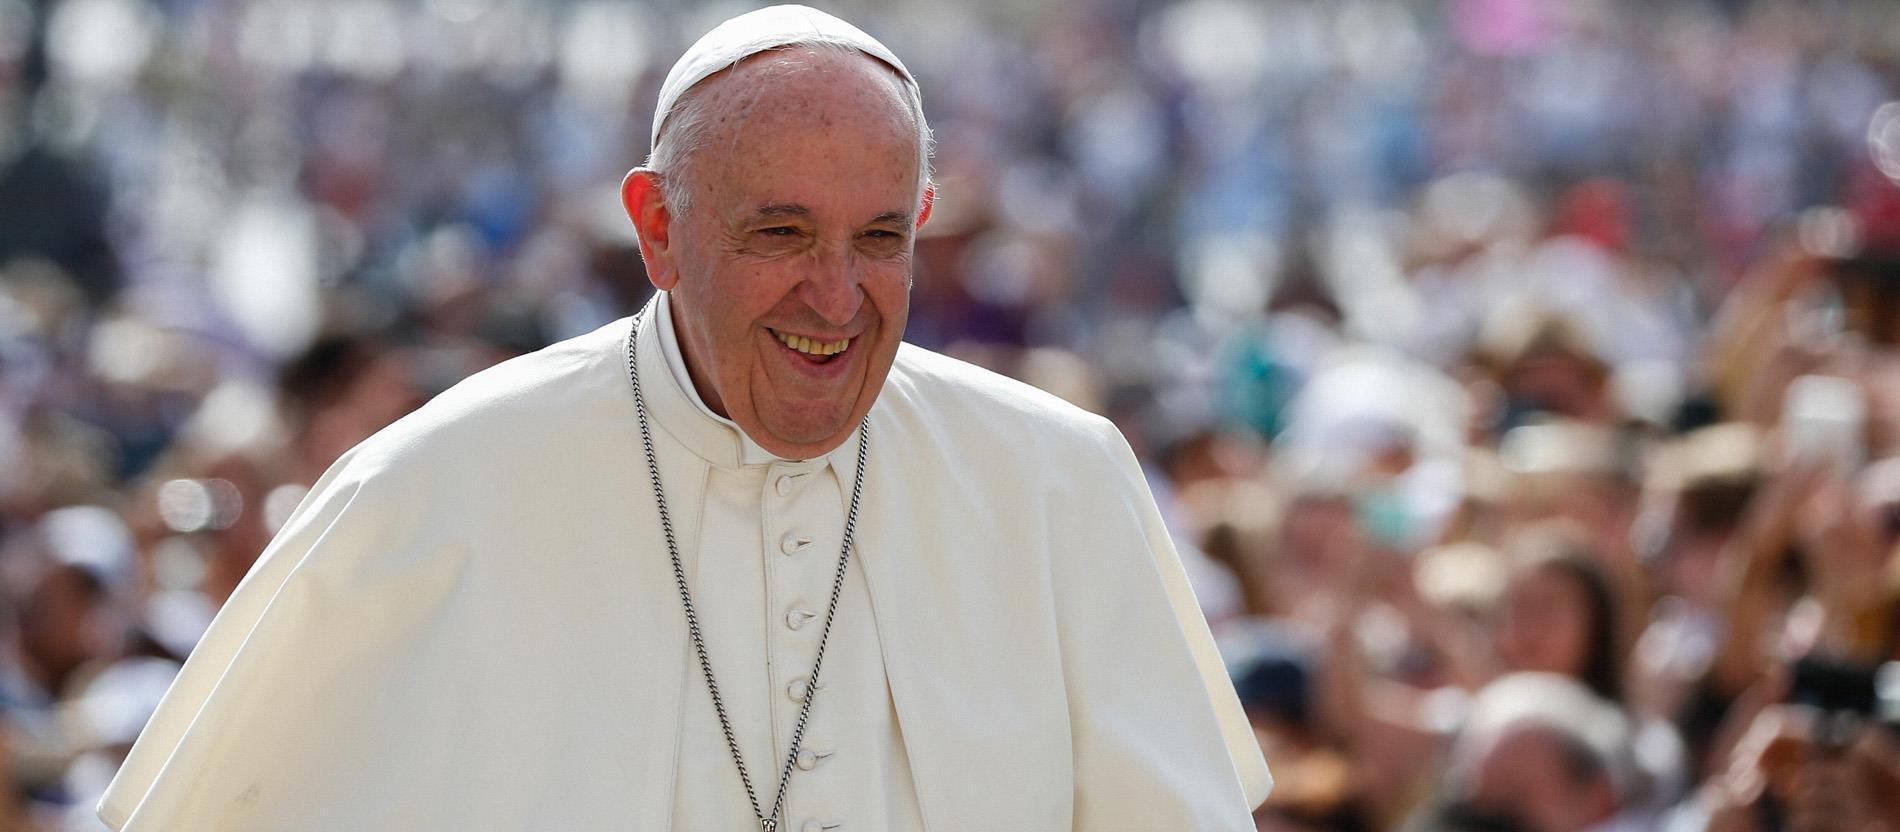 Jesuiten Papst